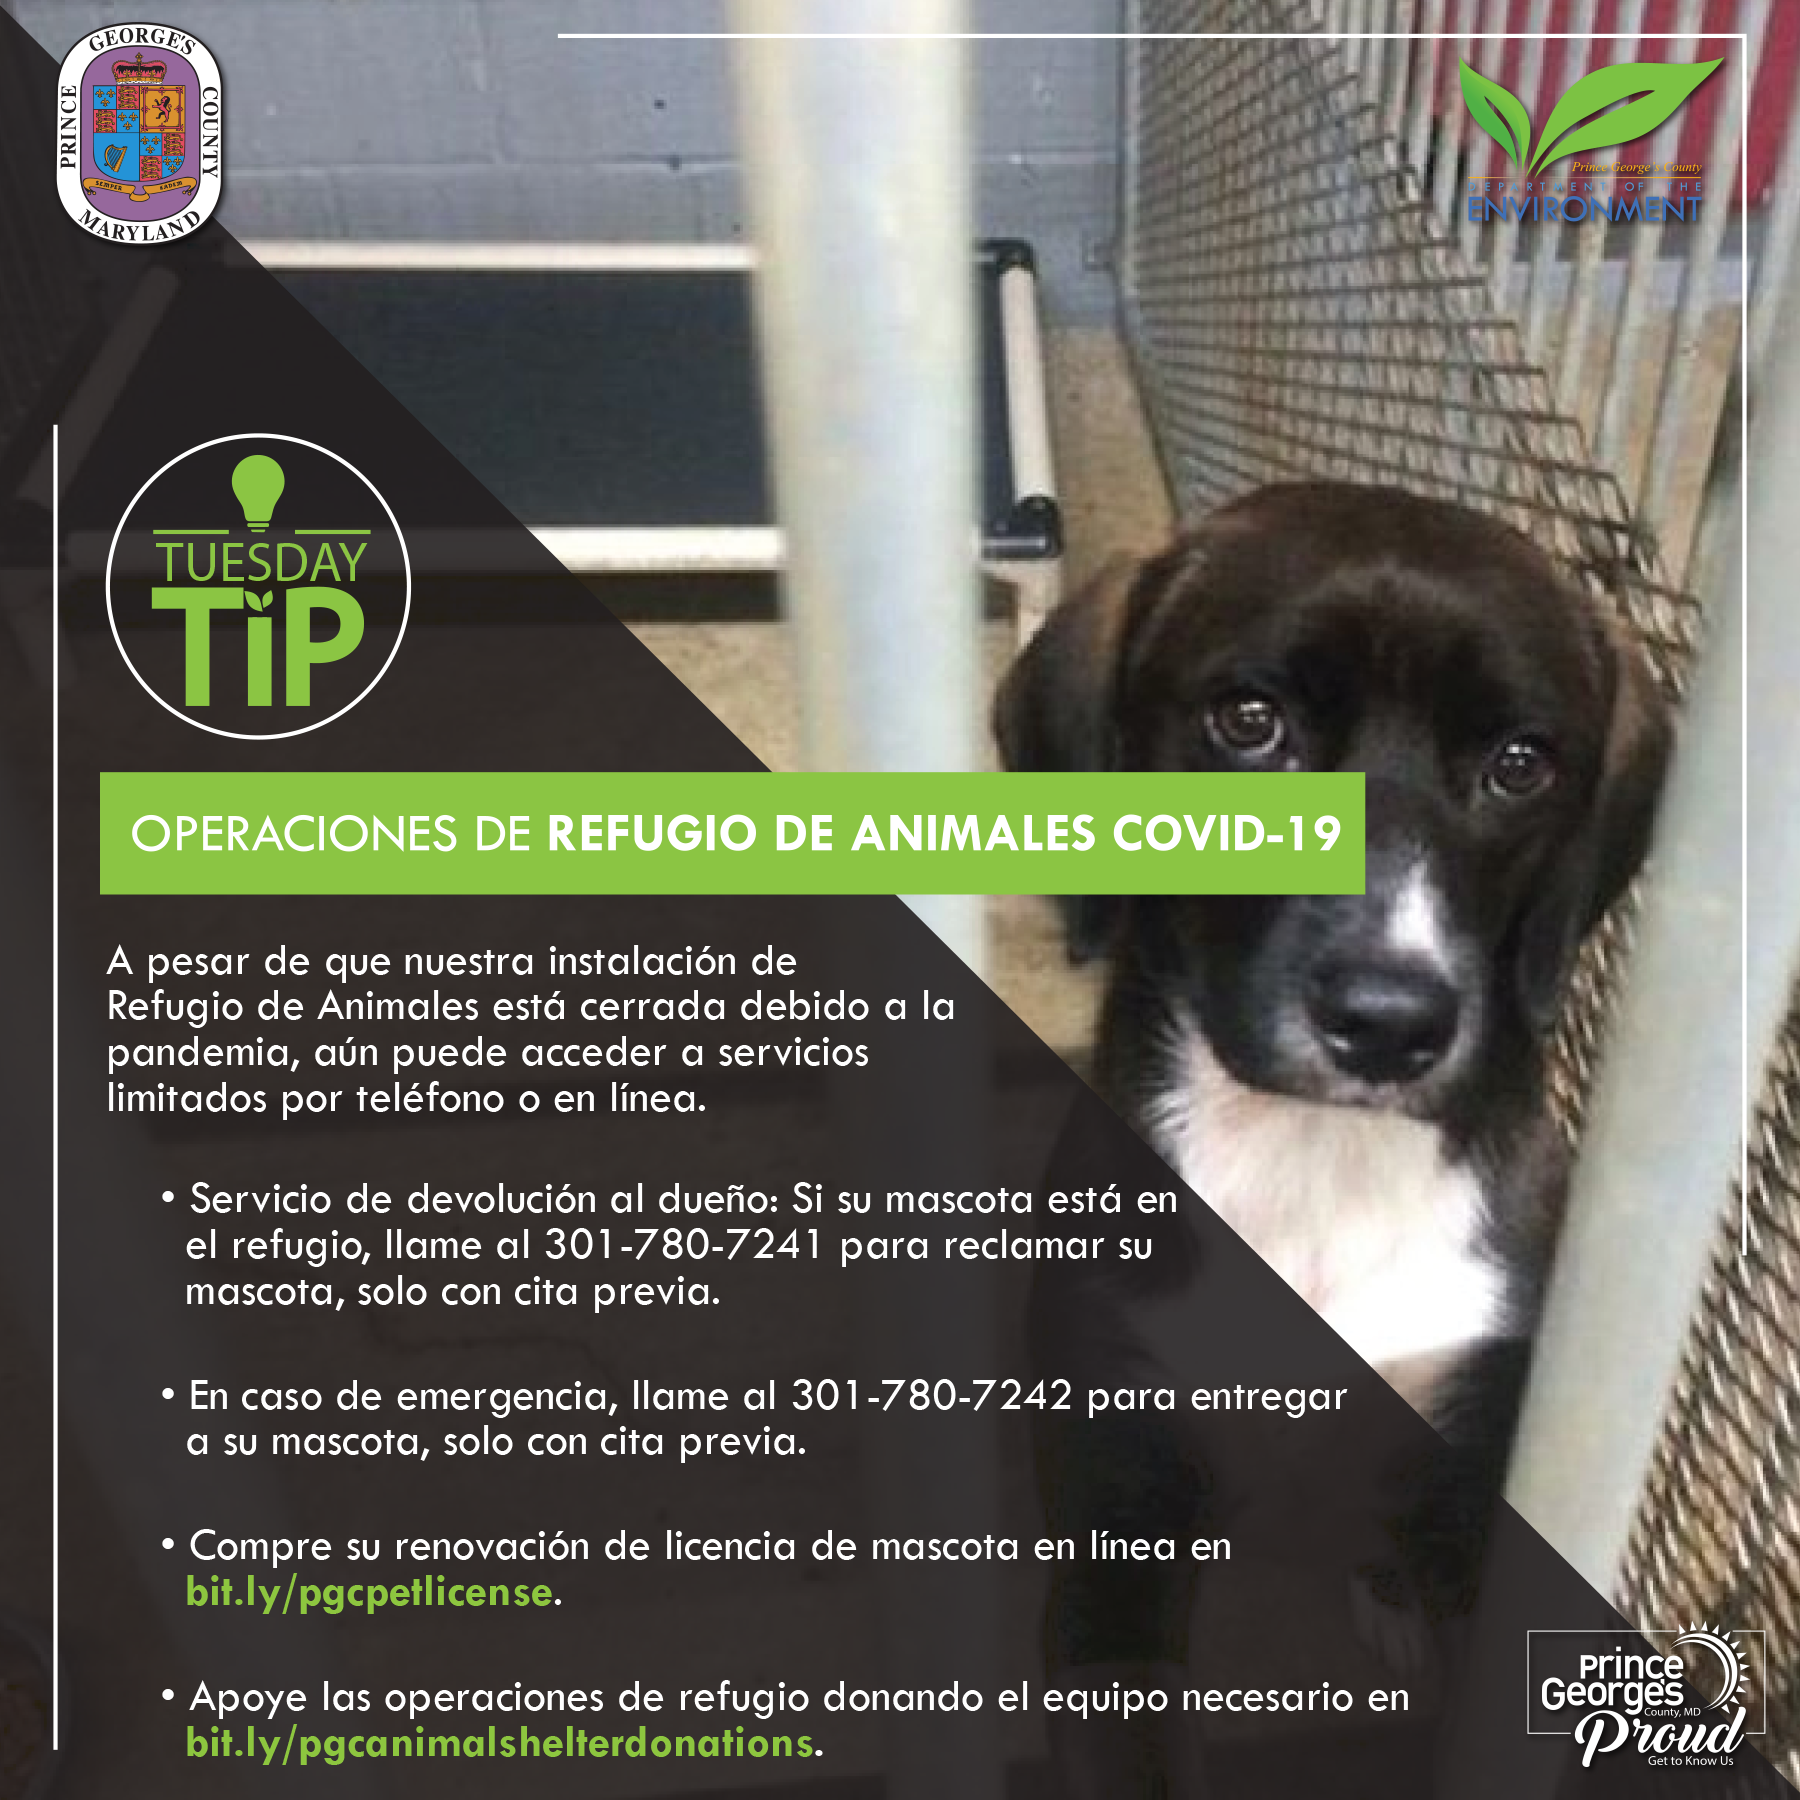 Tues tip 7.14.20 Animal shelter sp